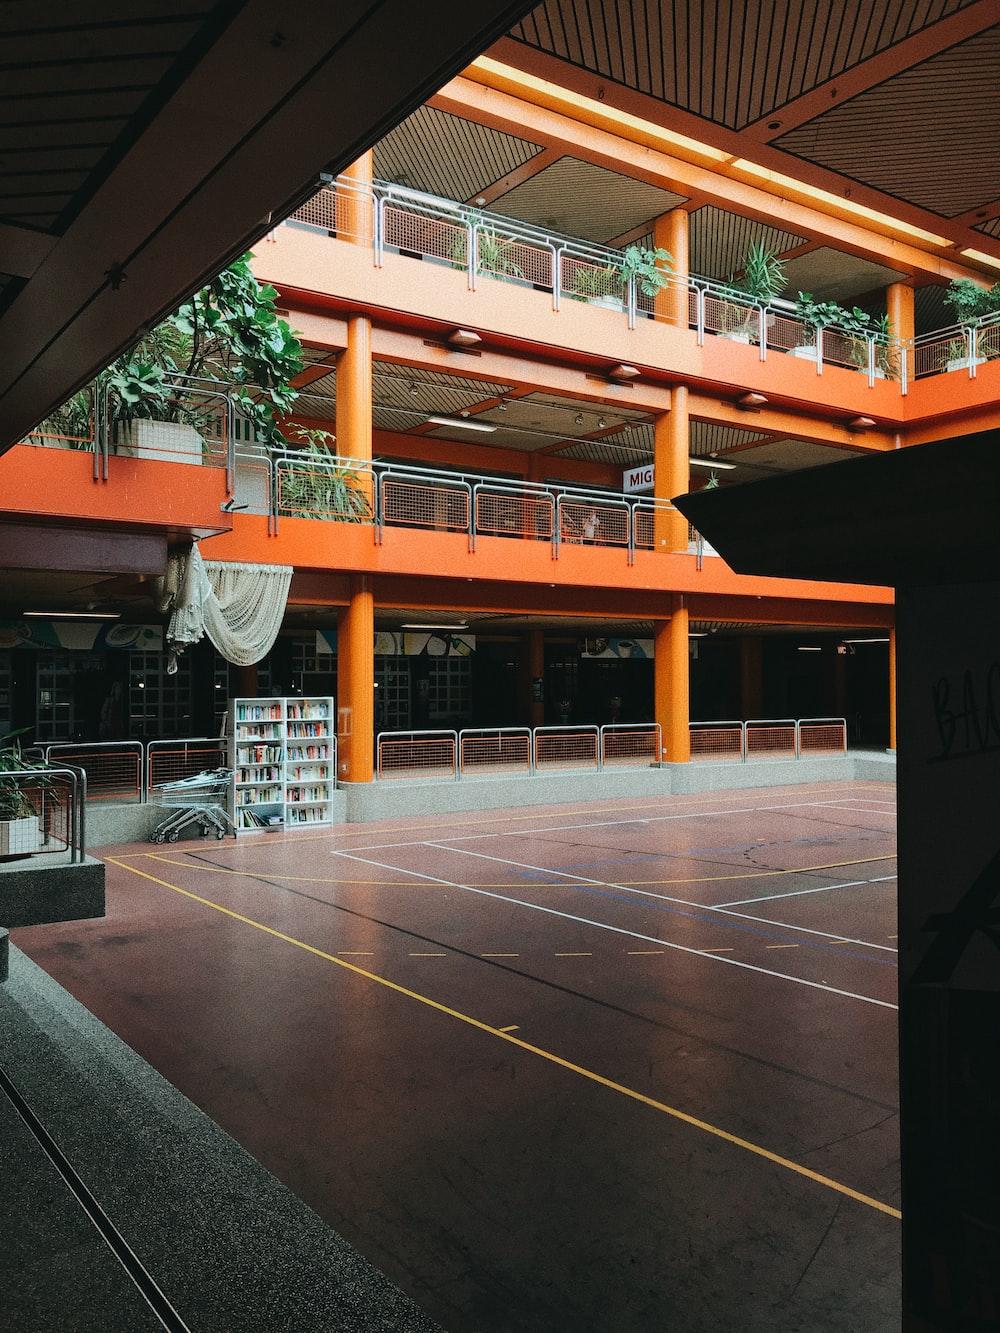 orange concrete building with no people